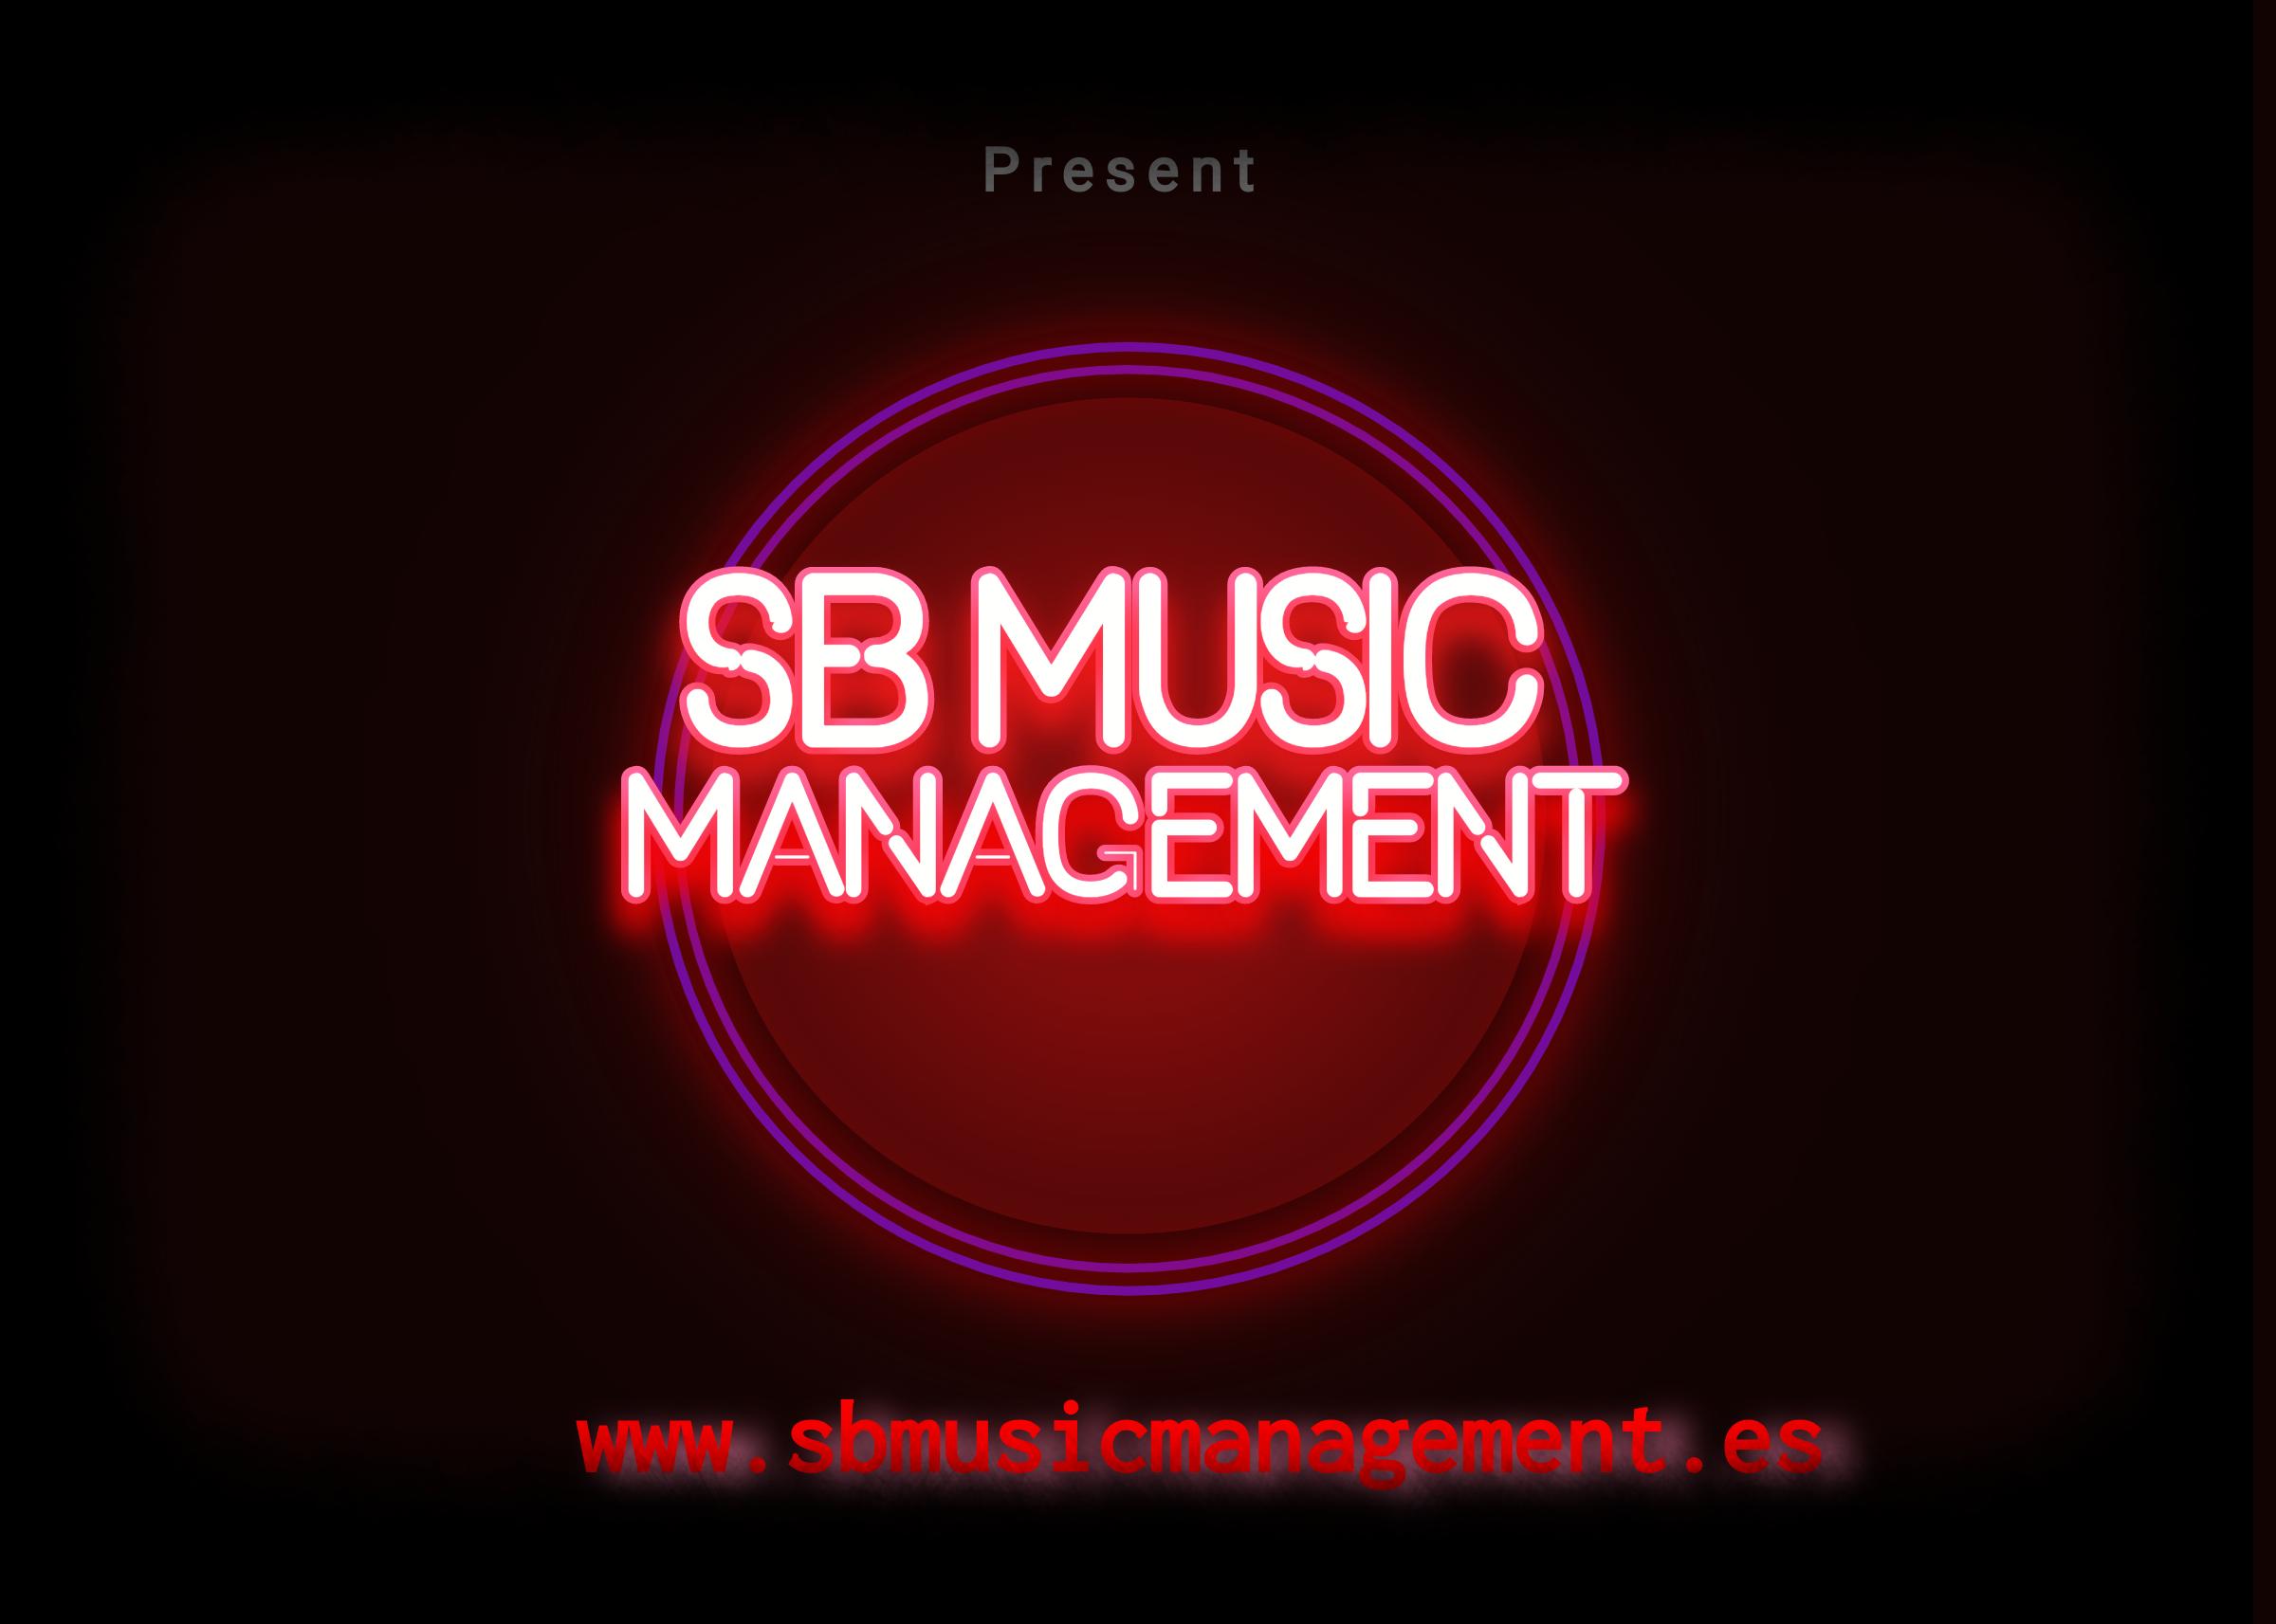 SB MANAGEMENT MUSIC & EVENTS